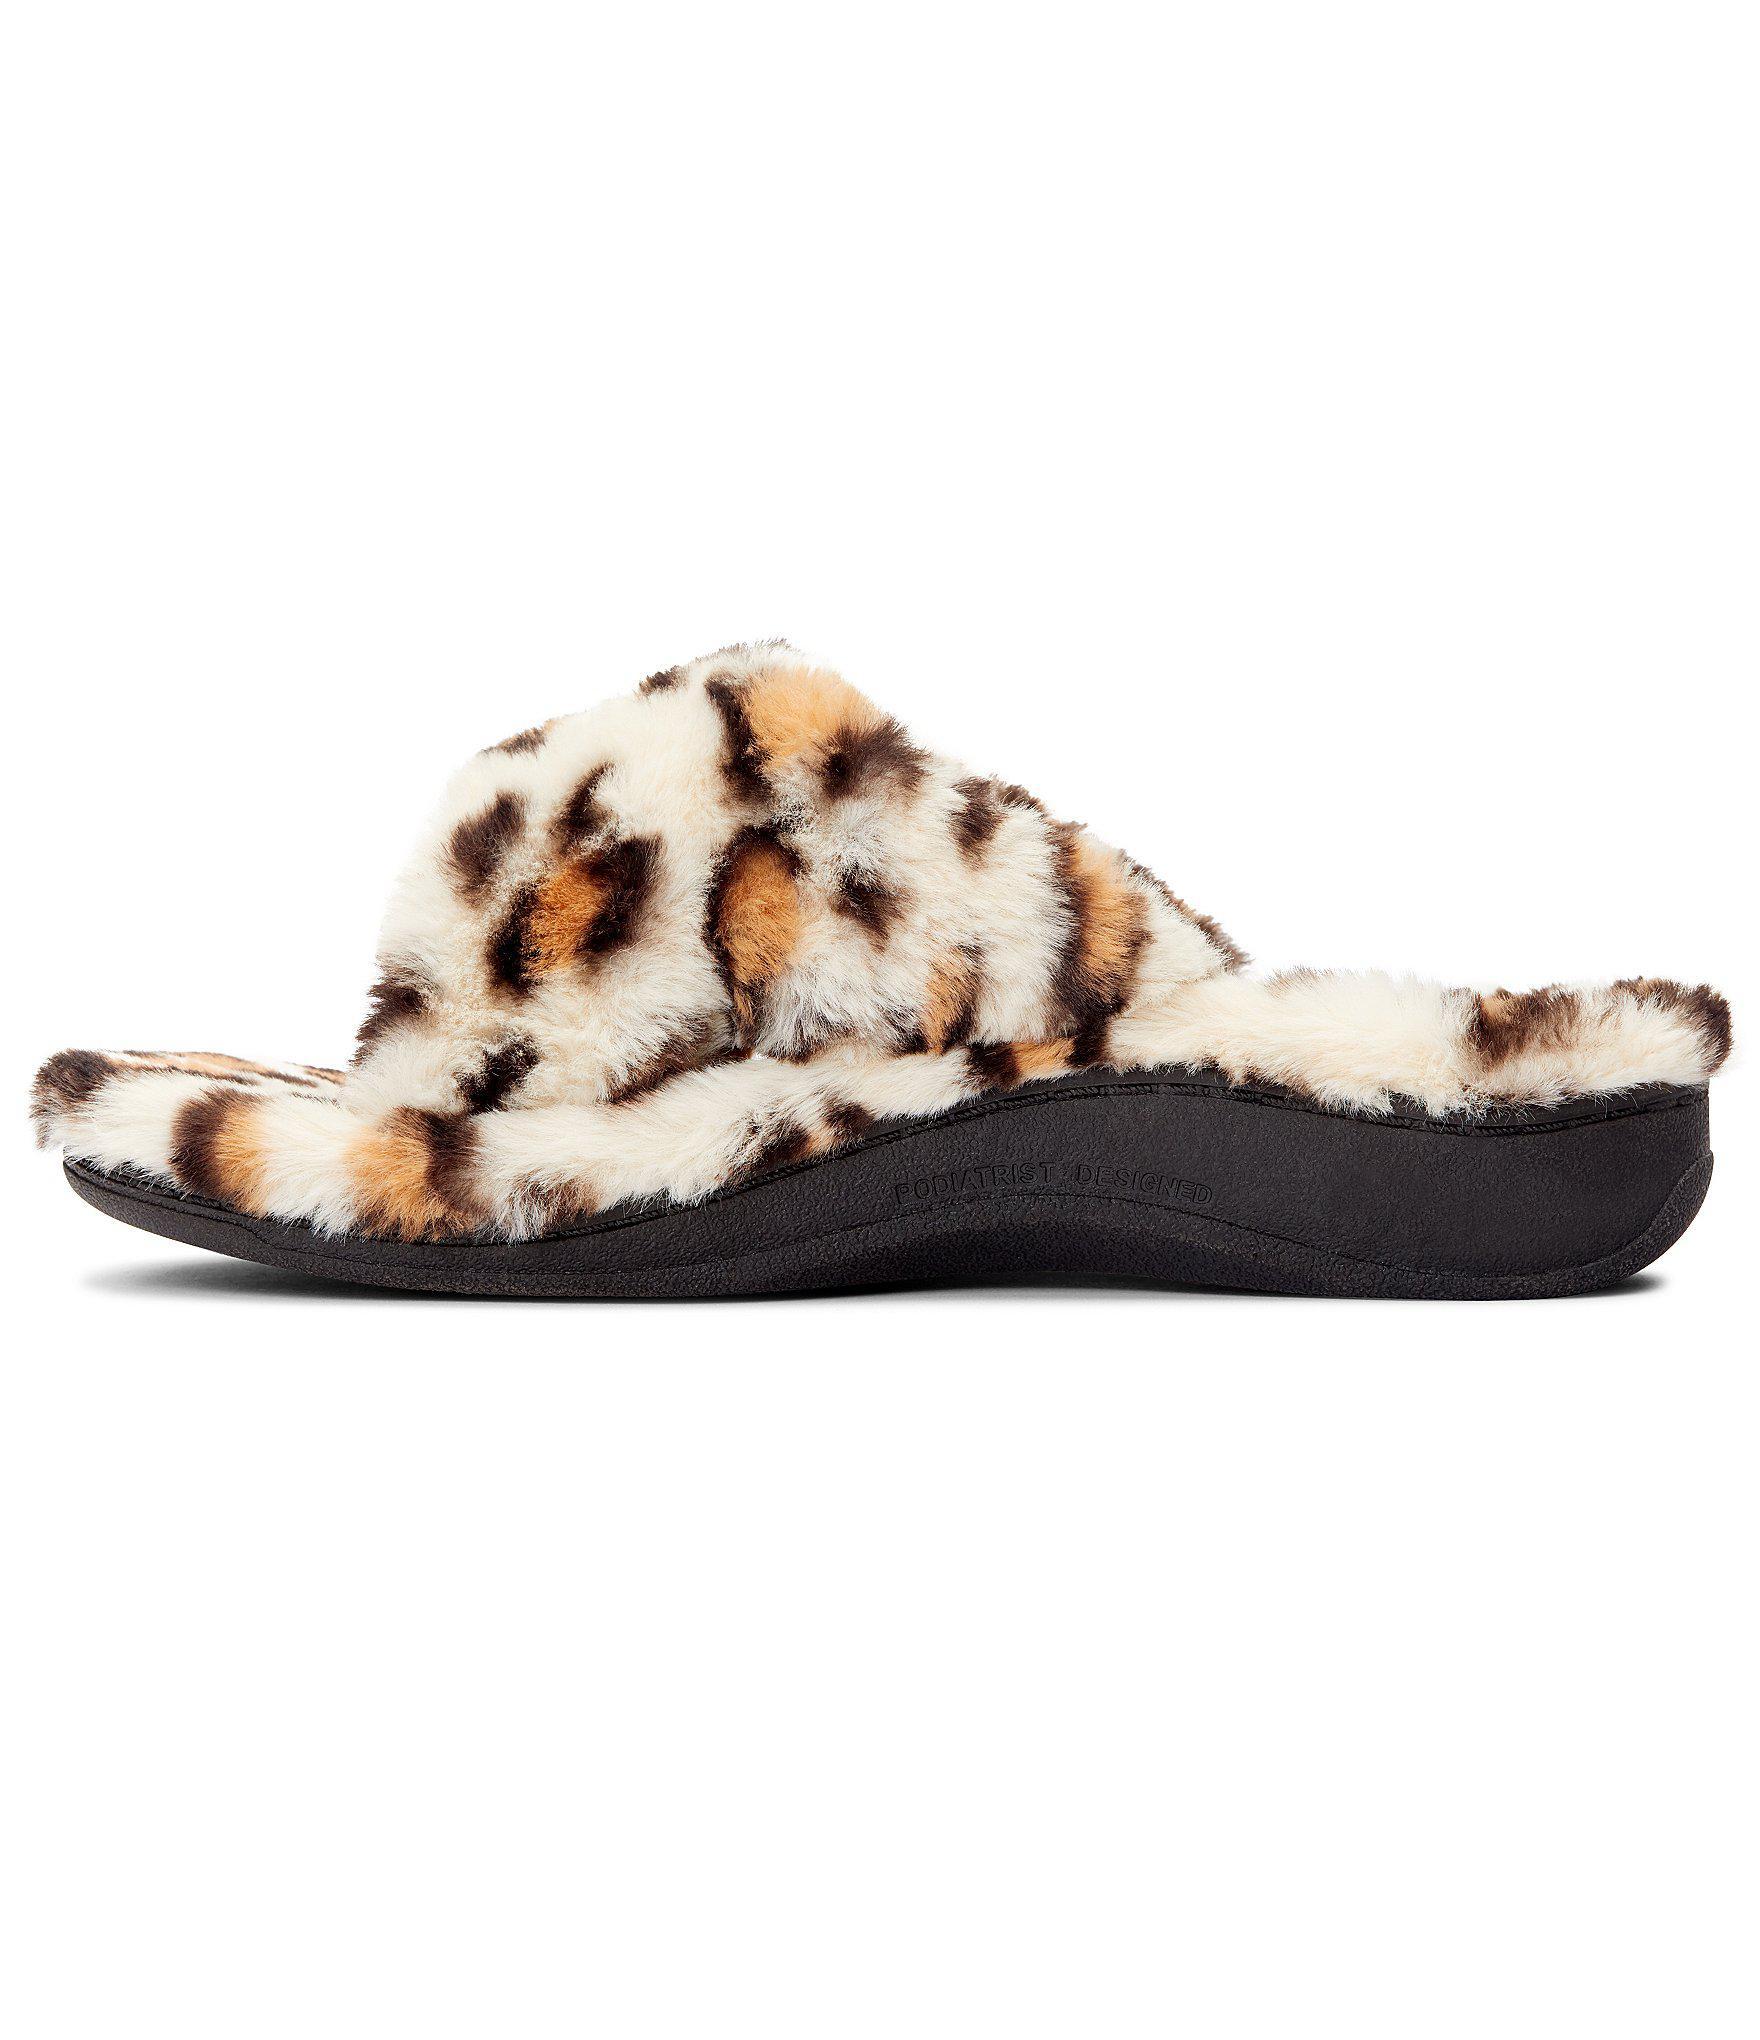 74703eaa53f Vionic - Multicolor Relax Plush Leopard Print Slippers - Lyst. View  fullscreen